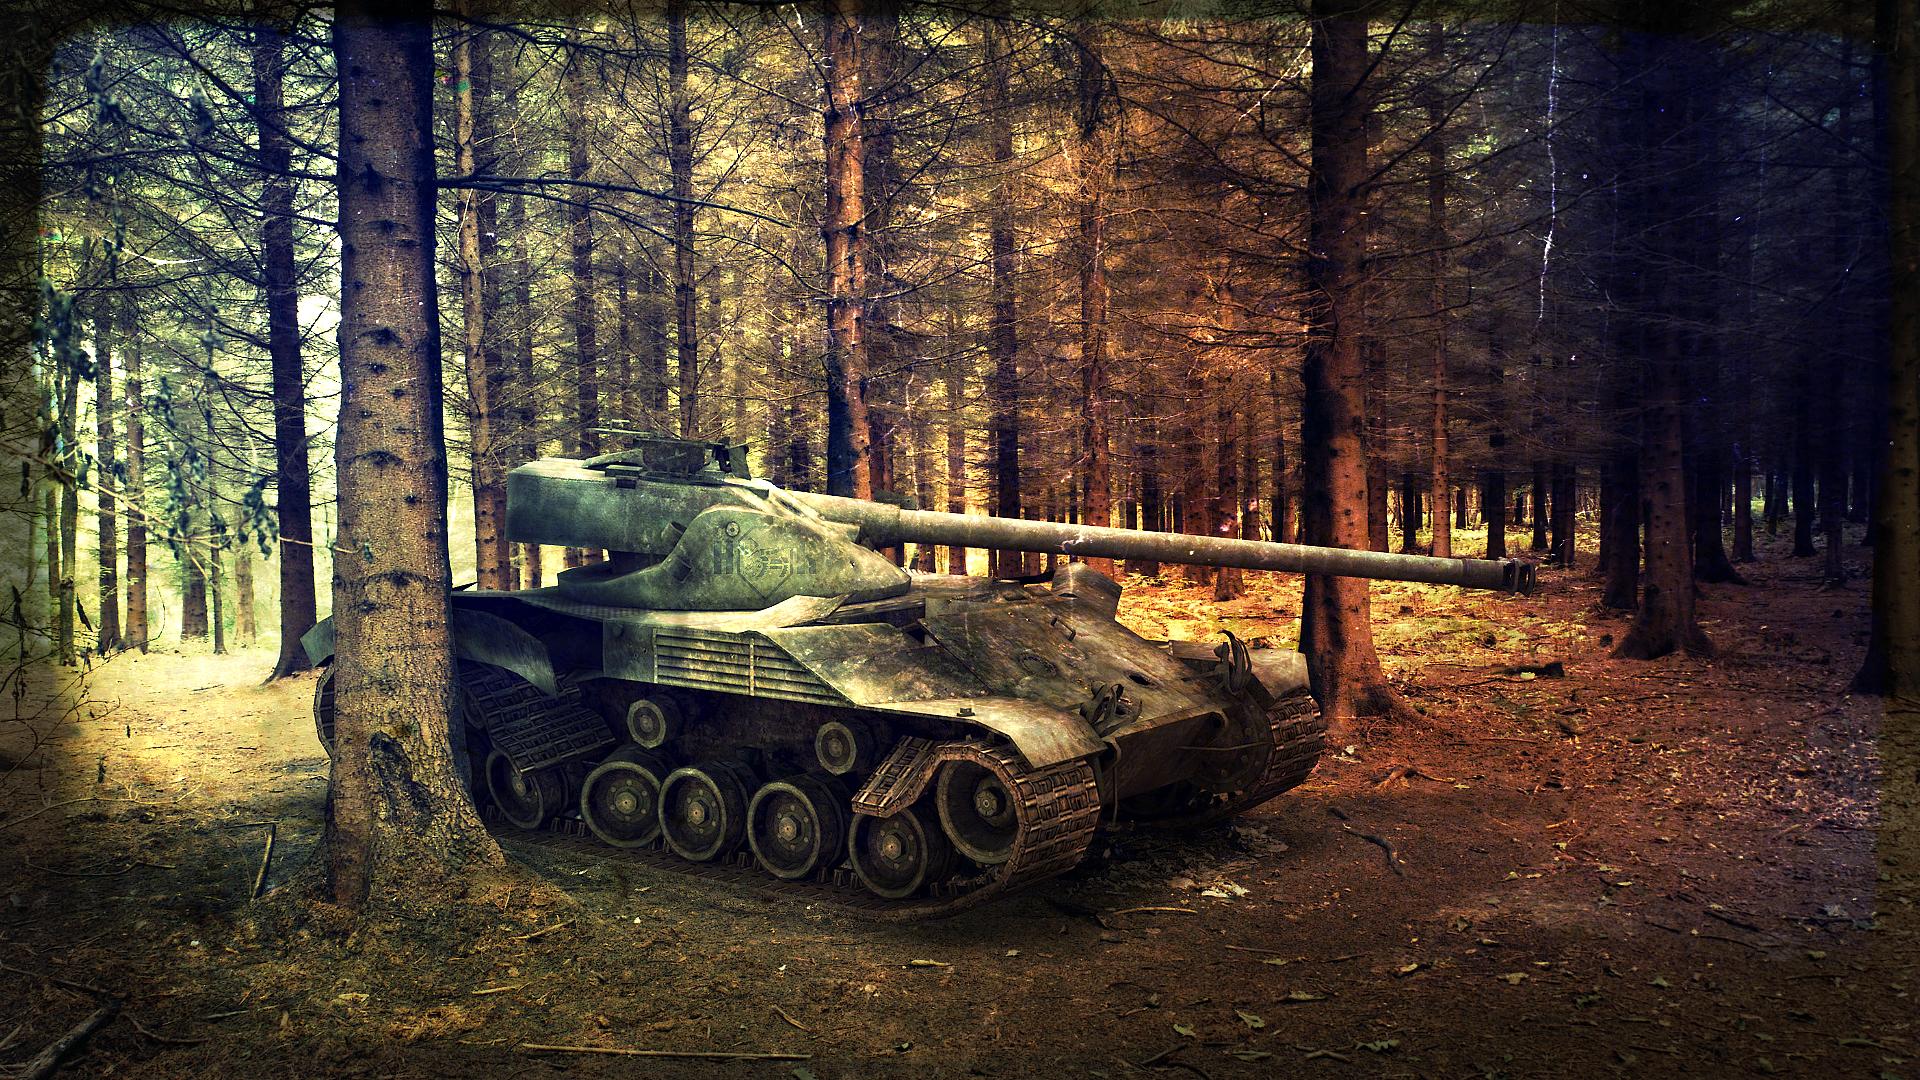 Обои 1366х768 для рабочего стола hd танки